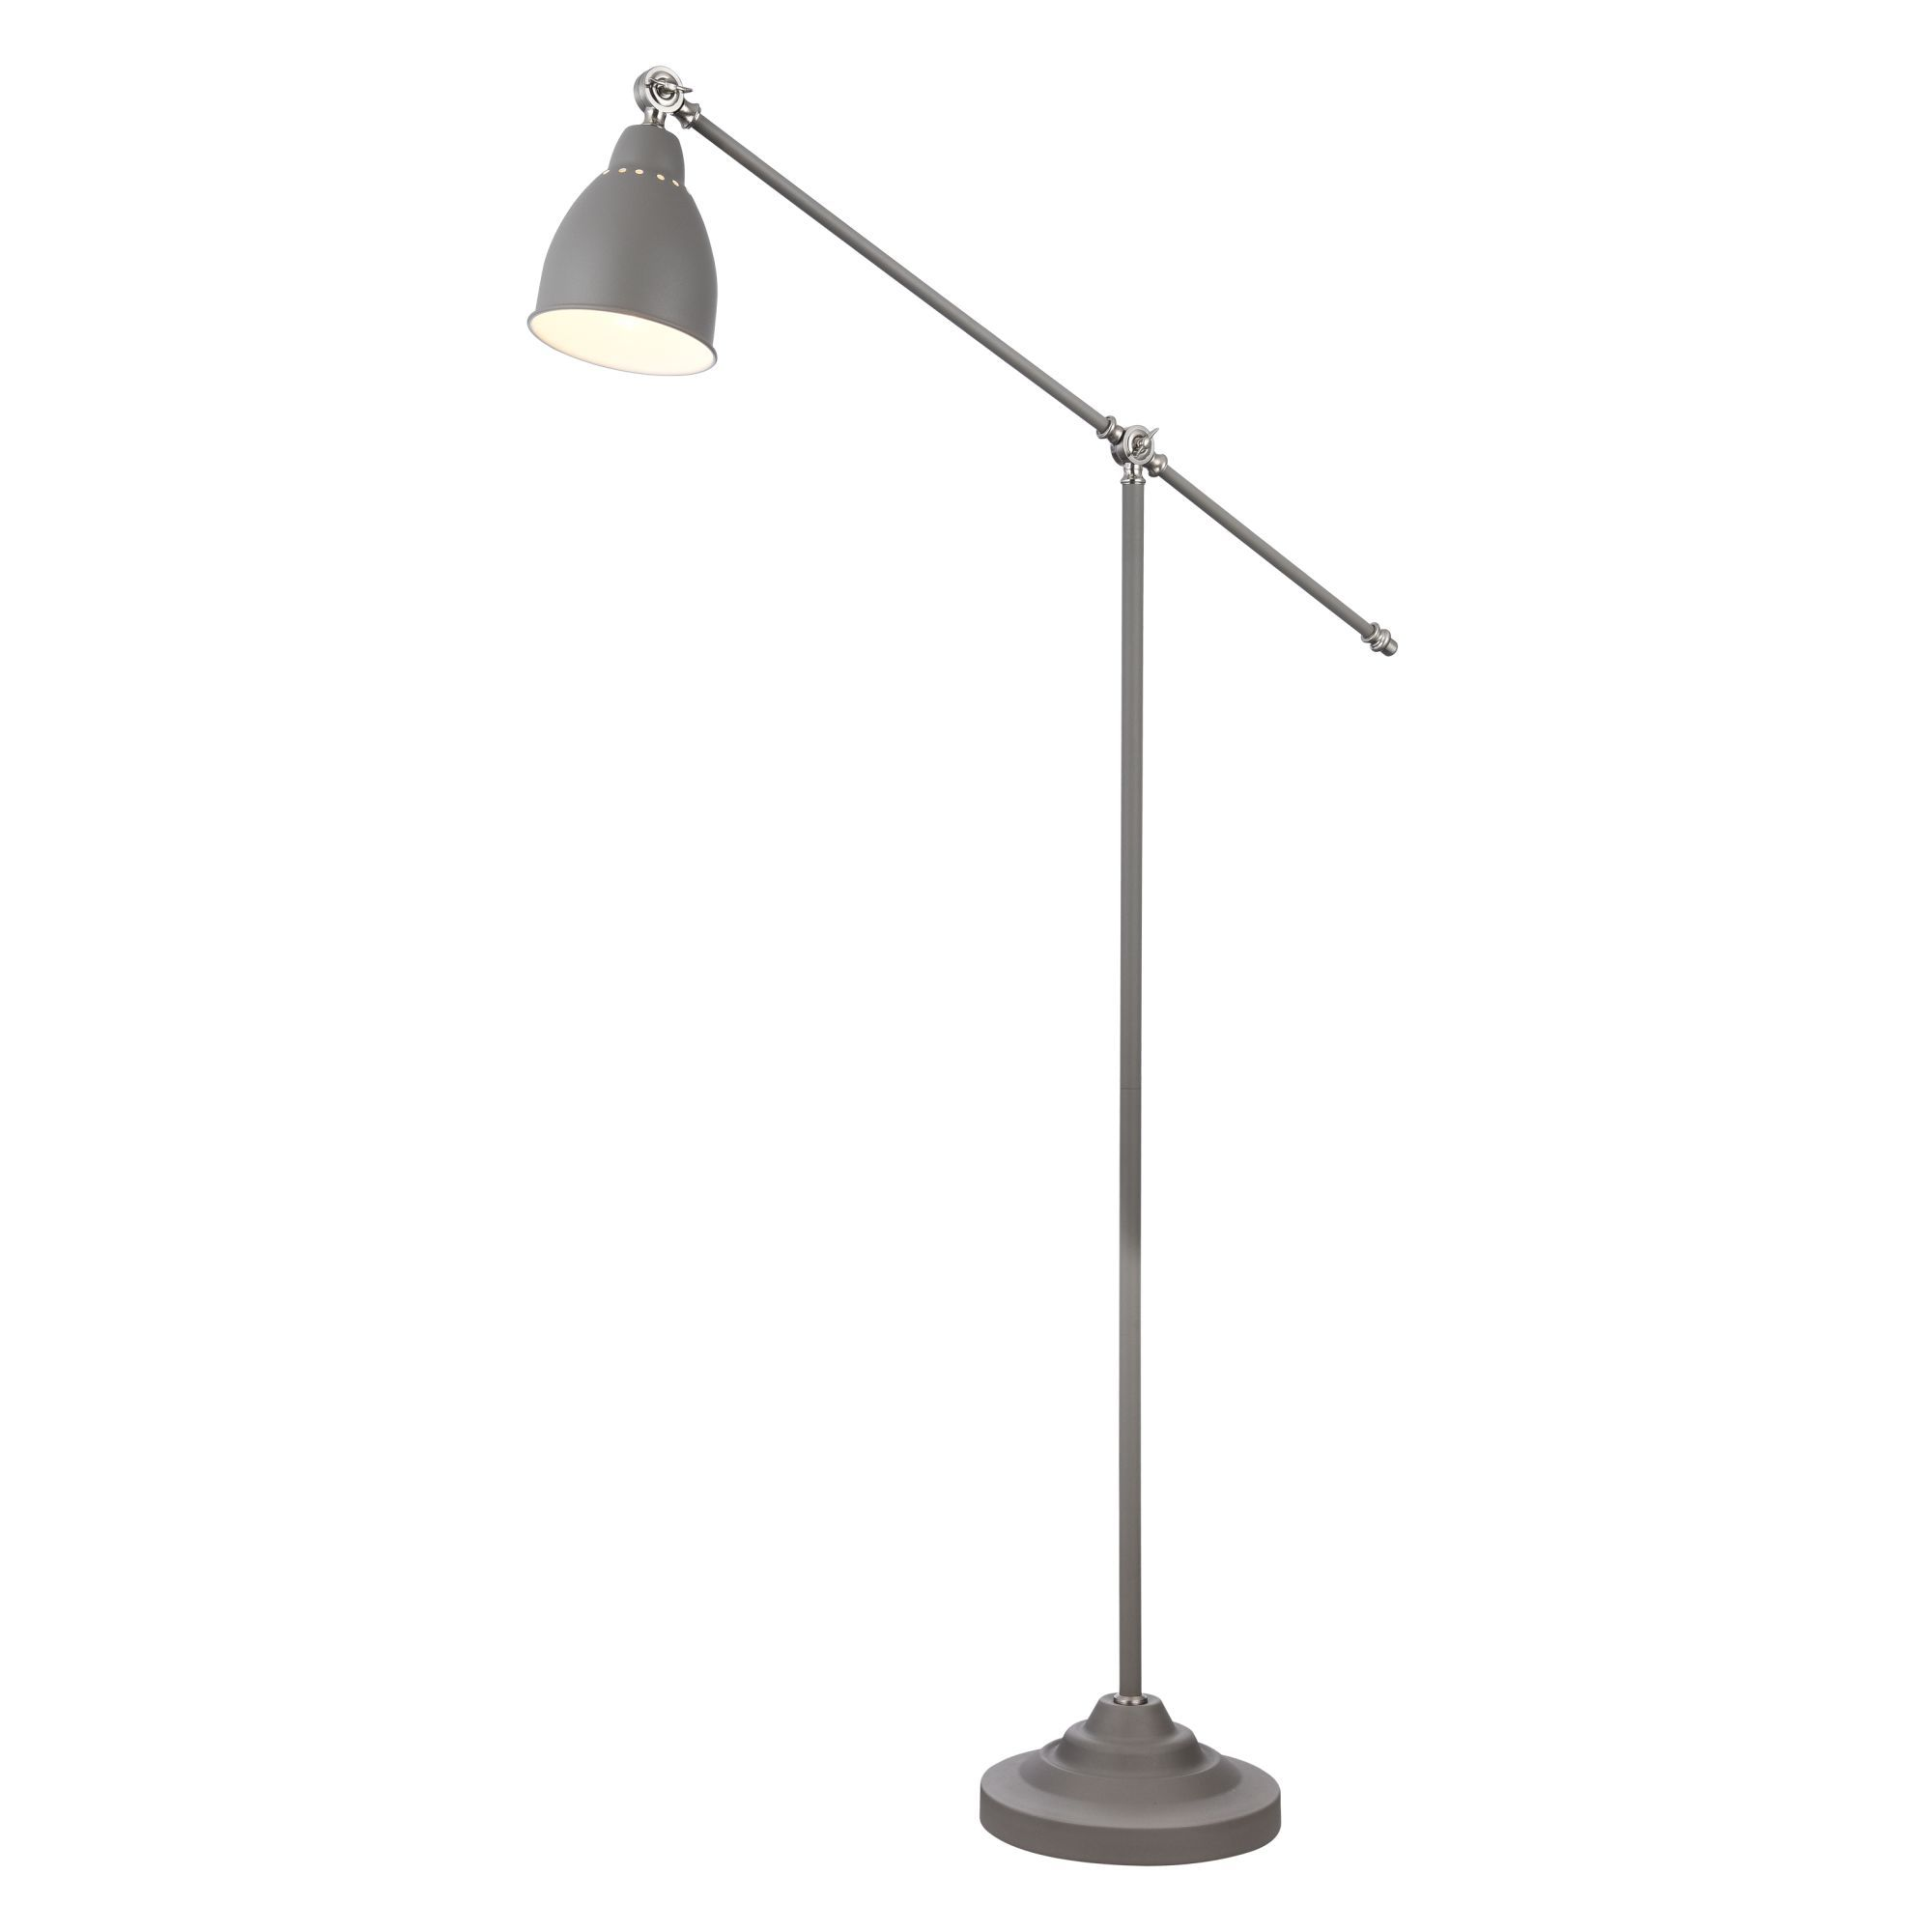 Domino Vloerlamp